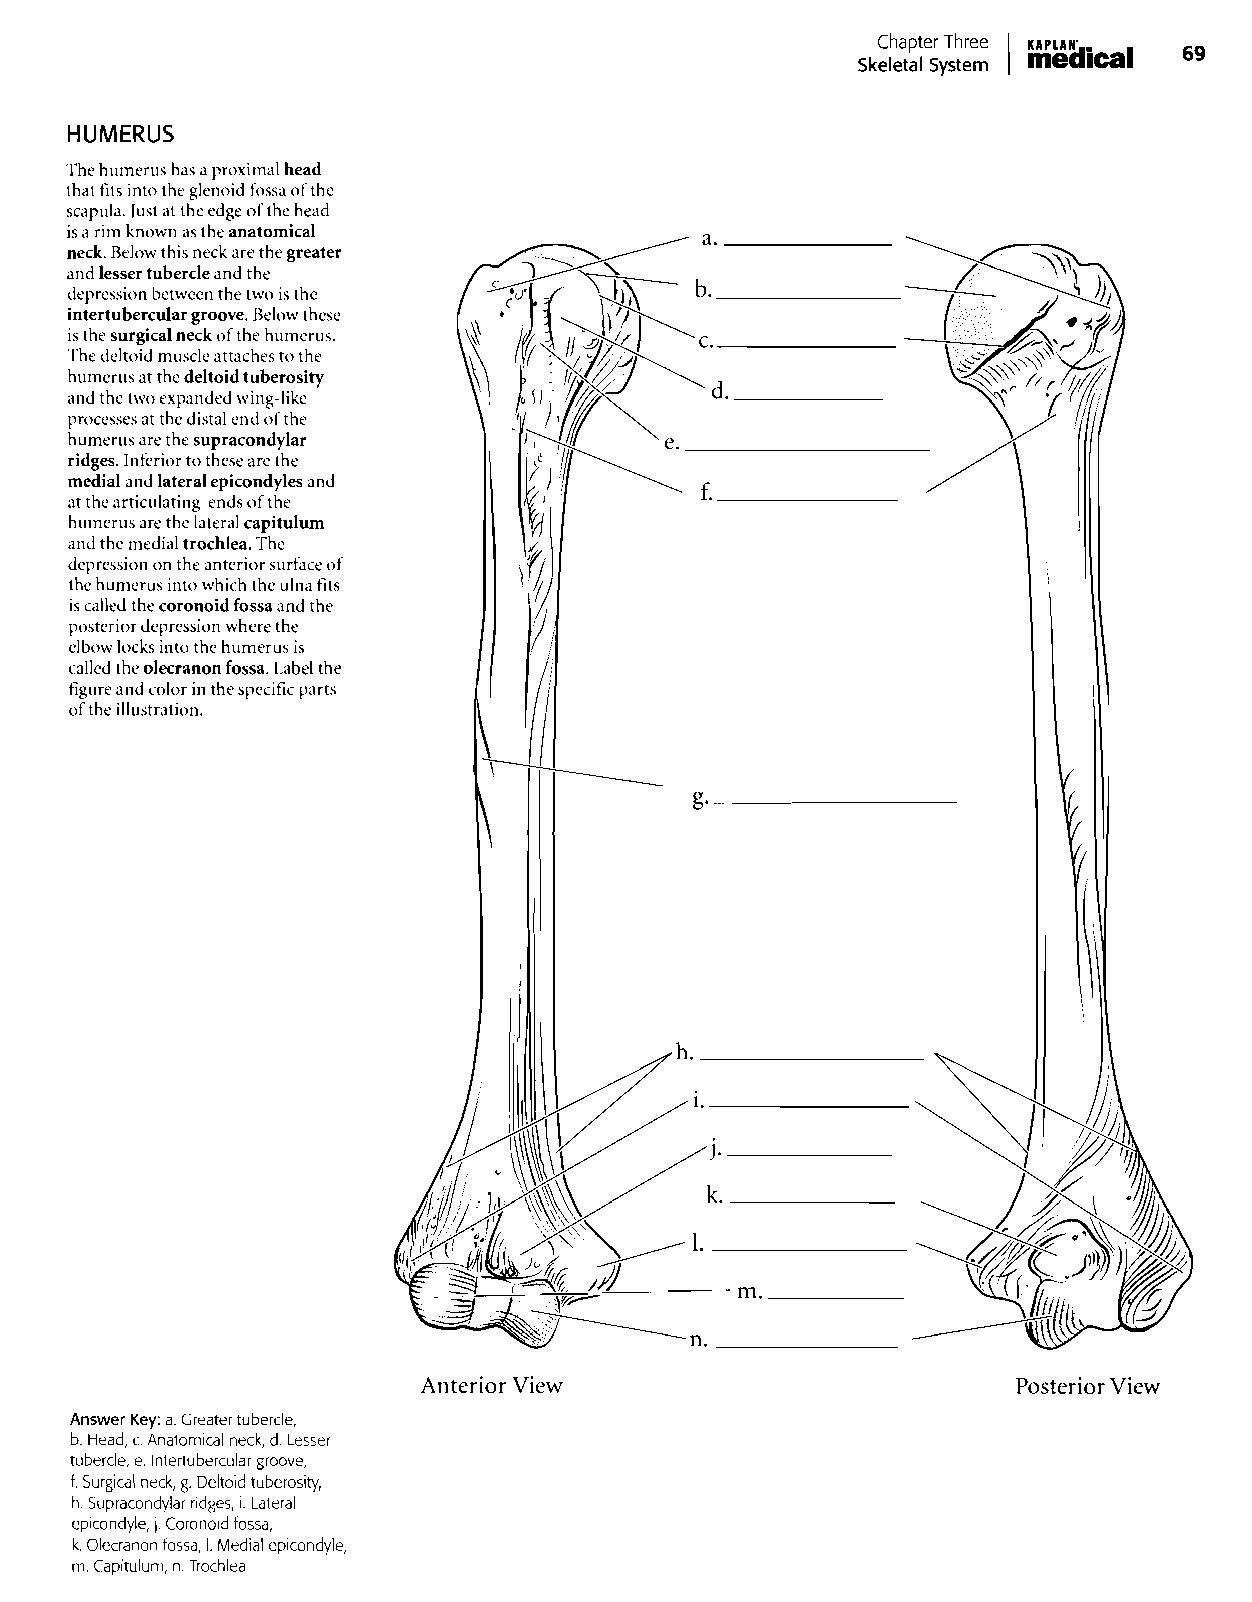 Kaplan Anatomy Coloring Book.pdf   Coloring books, Anatomy ...